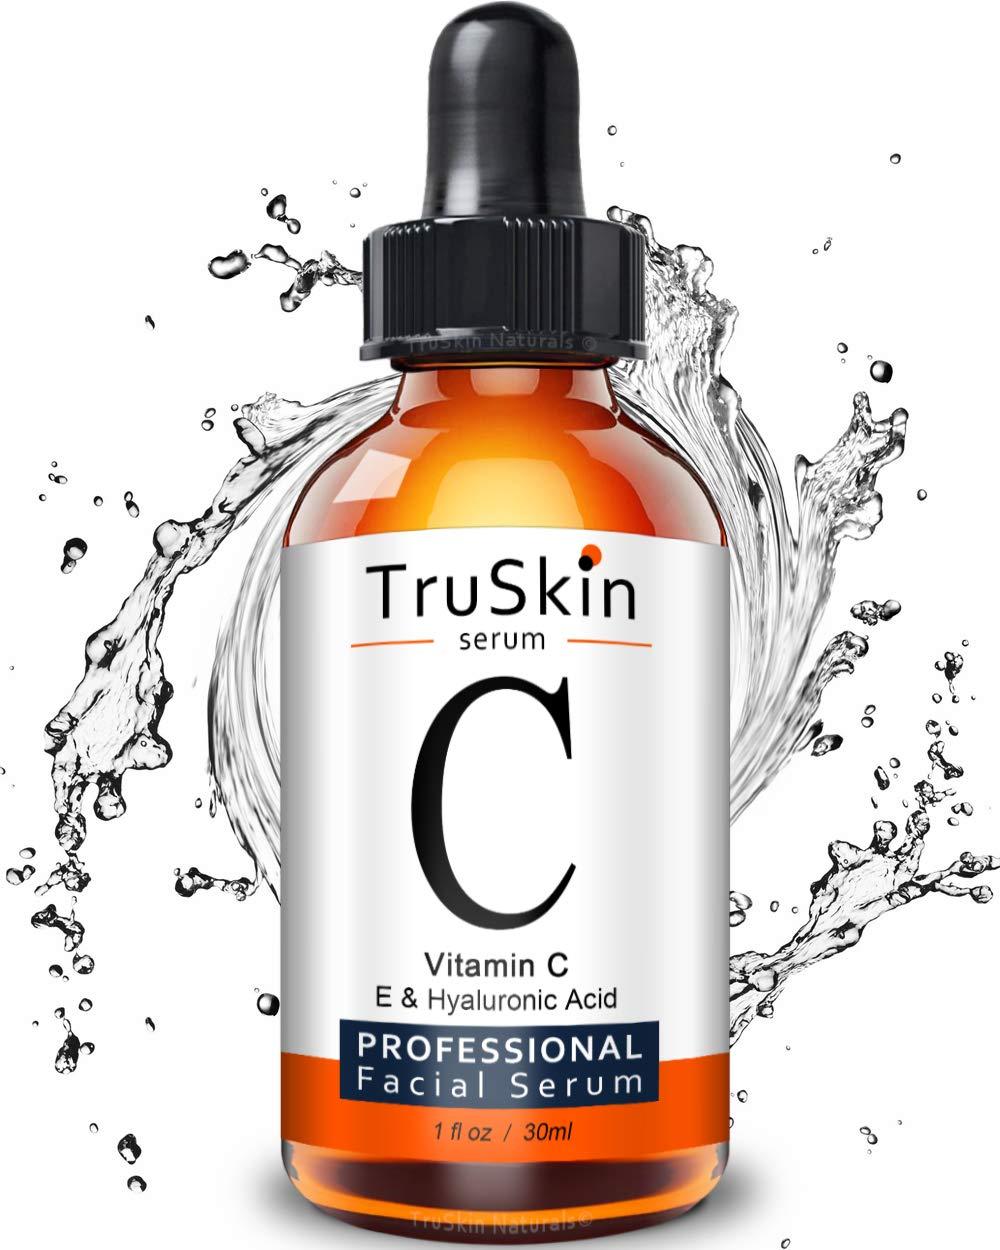 TruSkin Vitamina C, E Serum, Ácido Hialurônico (30ml)